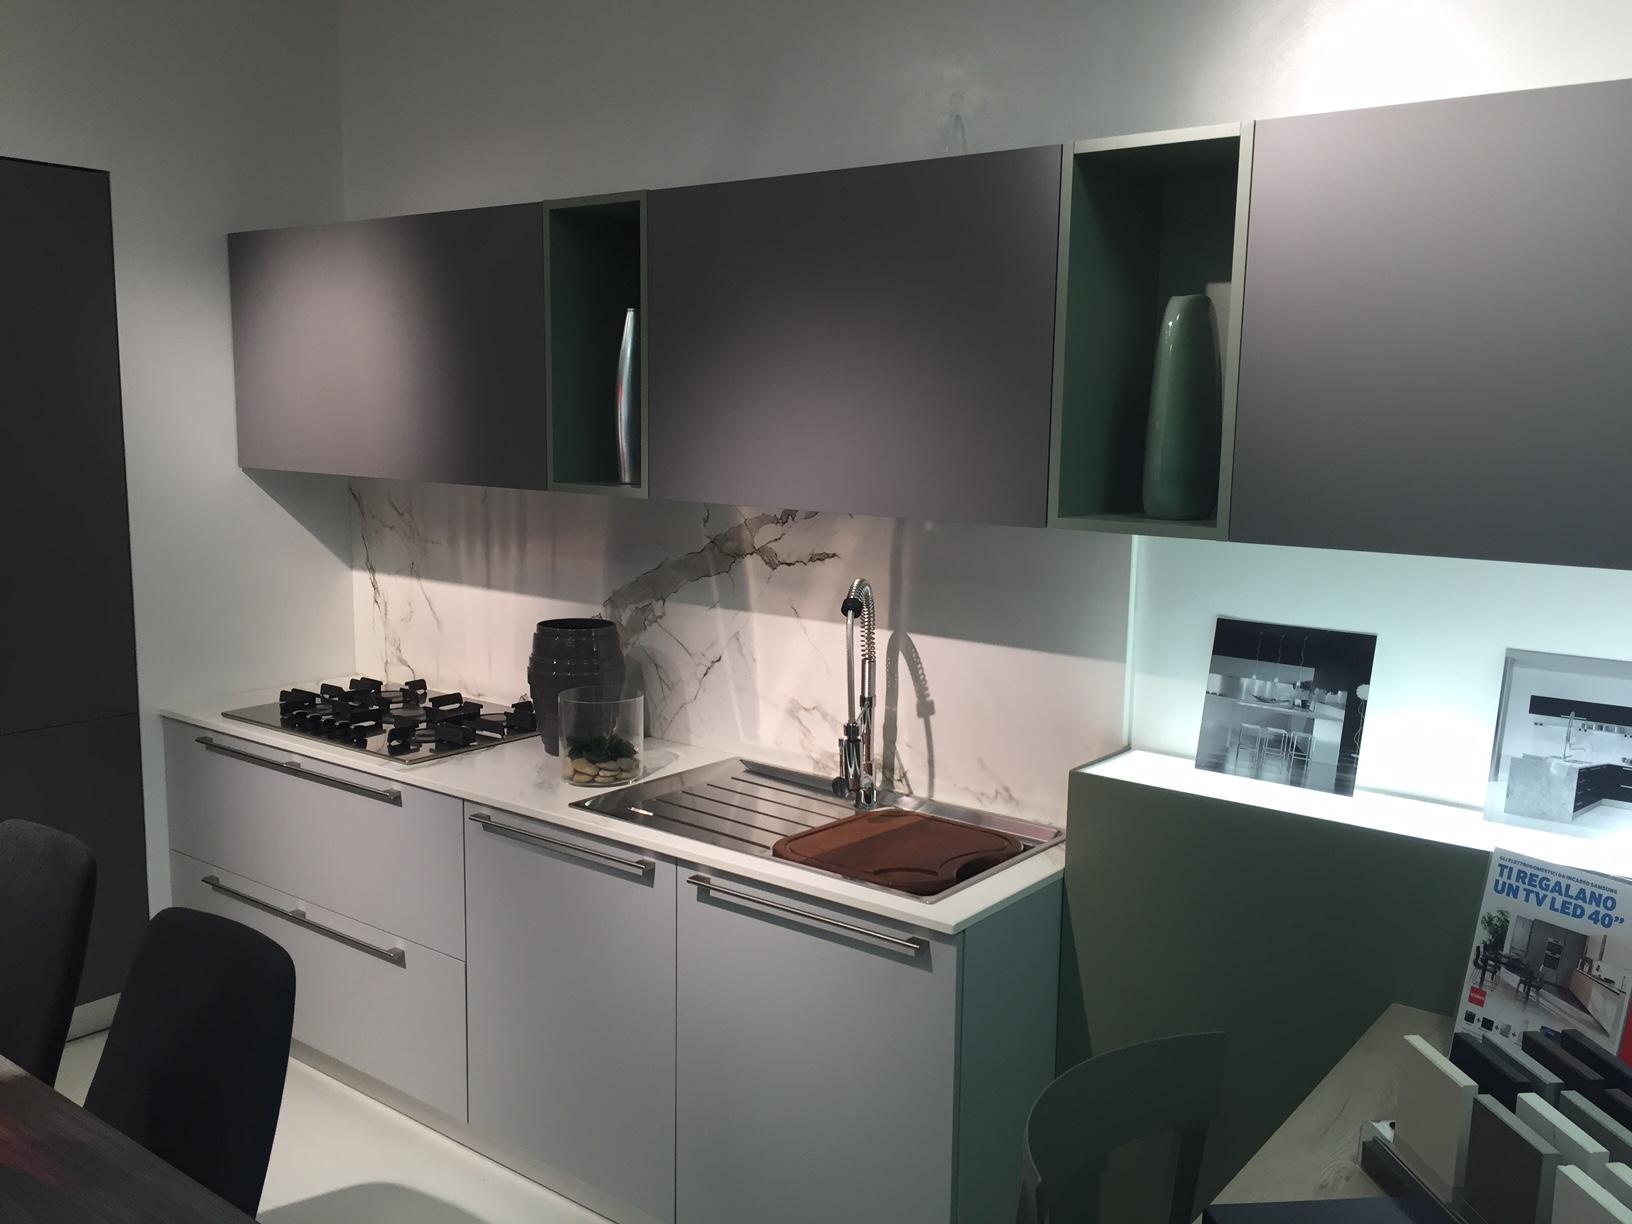 Cucina doimo cucine cromatika laminato opaco cucine a - Cucine doimo prezzi ...